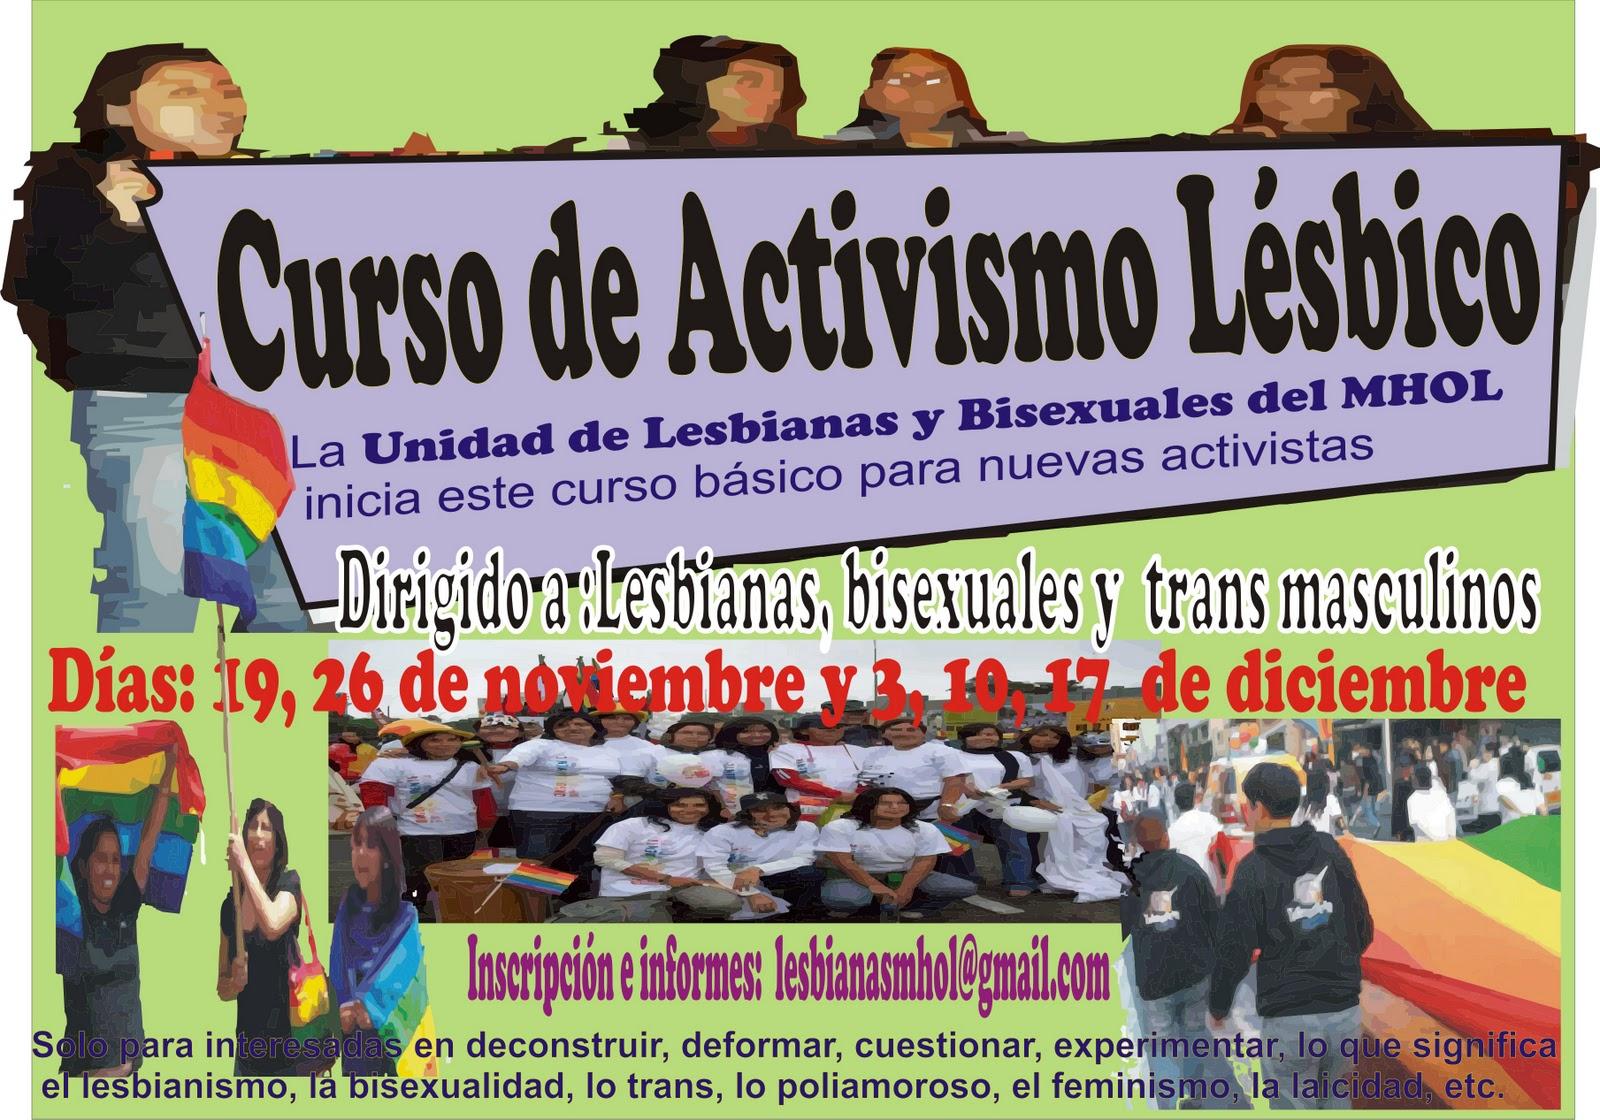 http://2.bp.blogspot.com/_s0Tg9YjVp7k/TNzPwd_AOZI/AAAAAAAAFQI/hbgf03FBNoE/s1600/CursoActivismoMhol.JPG